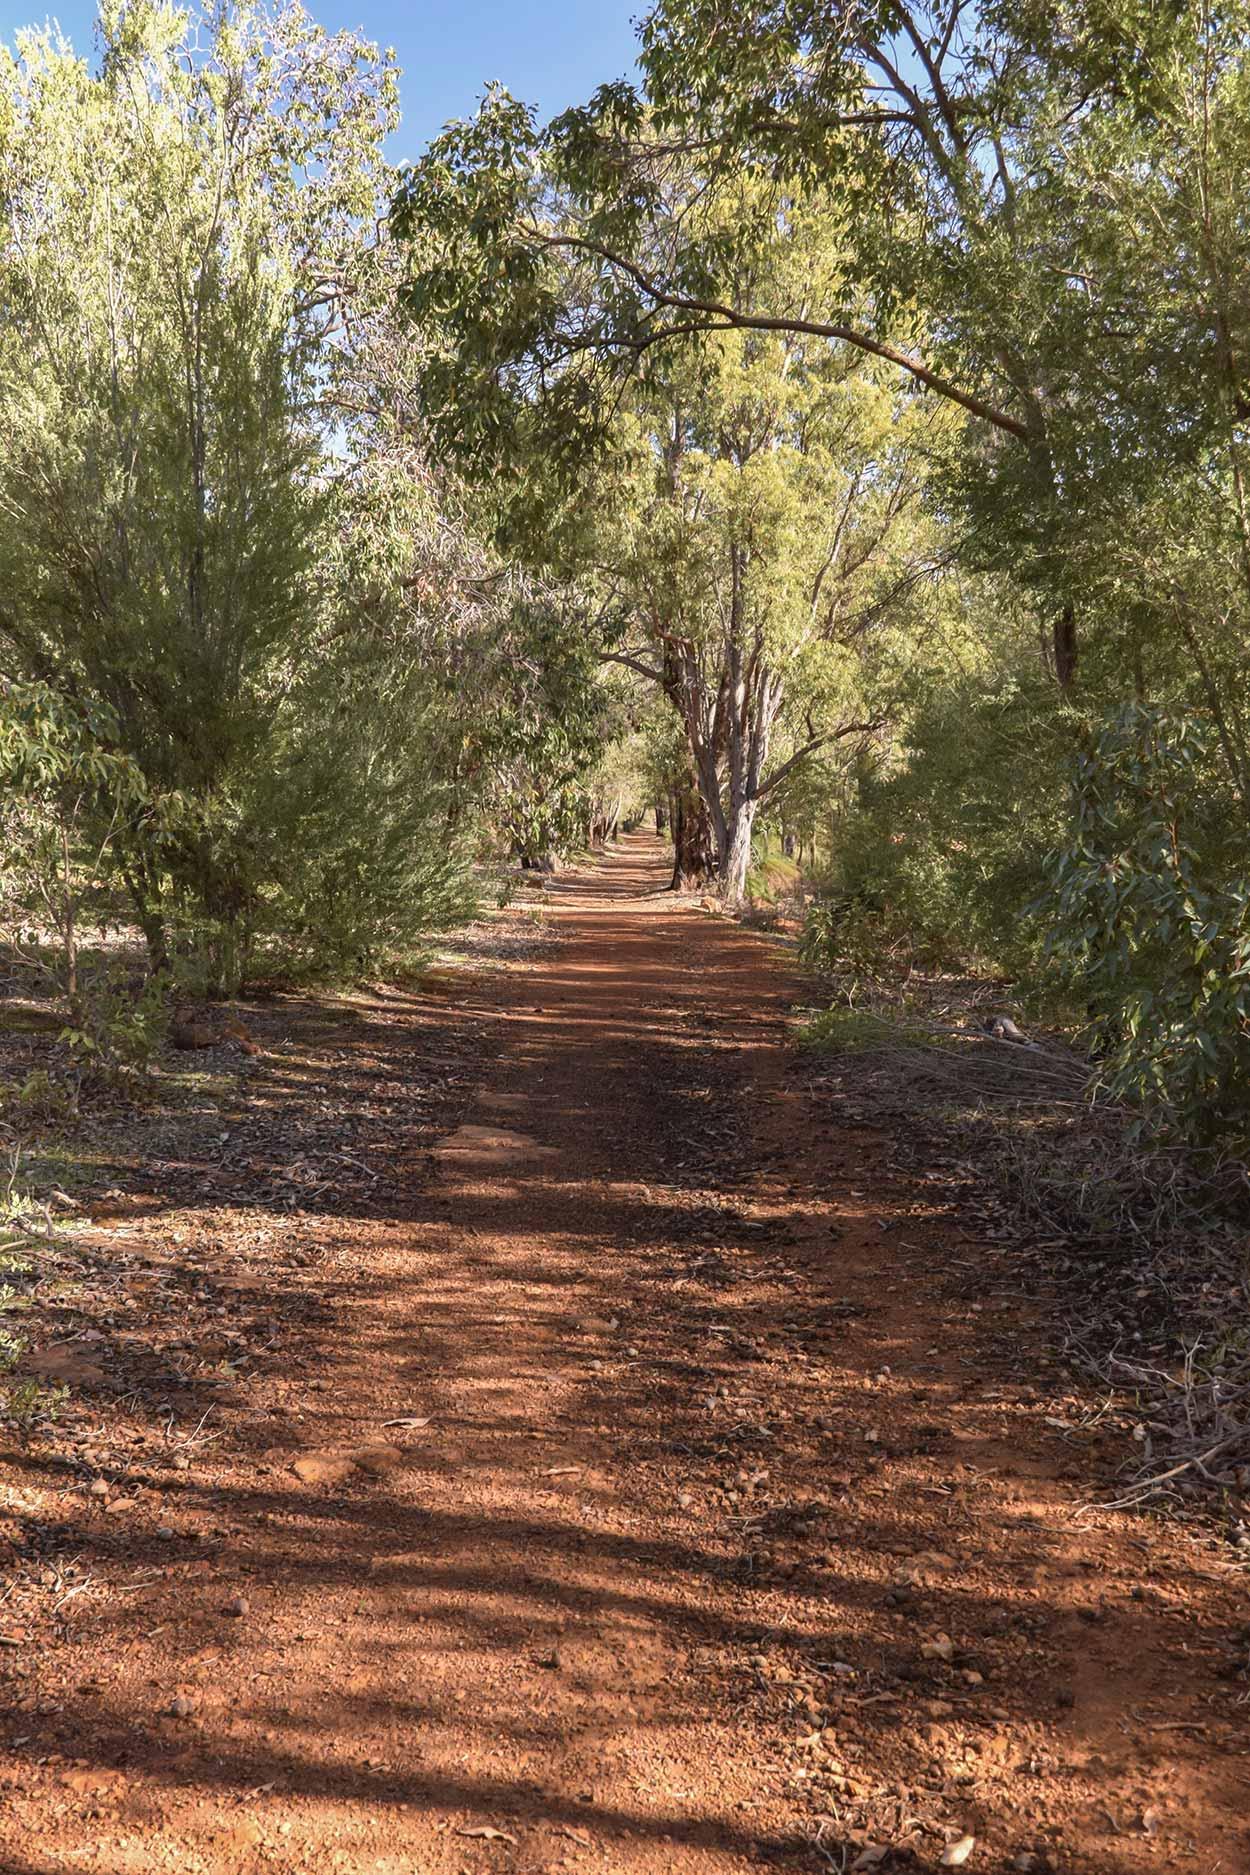 Walking in Churchman's, Wungong Regional Park, Perth, Western Australia